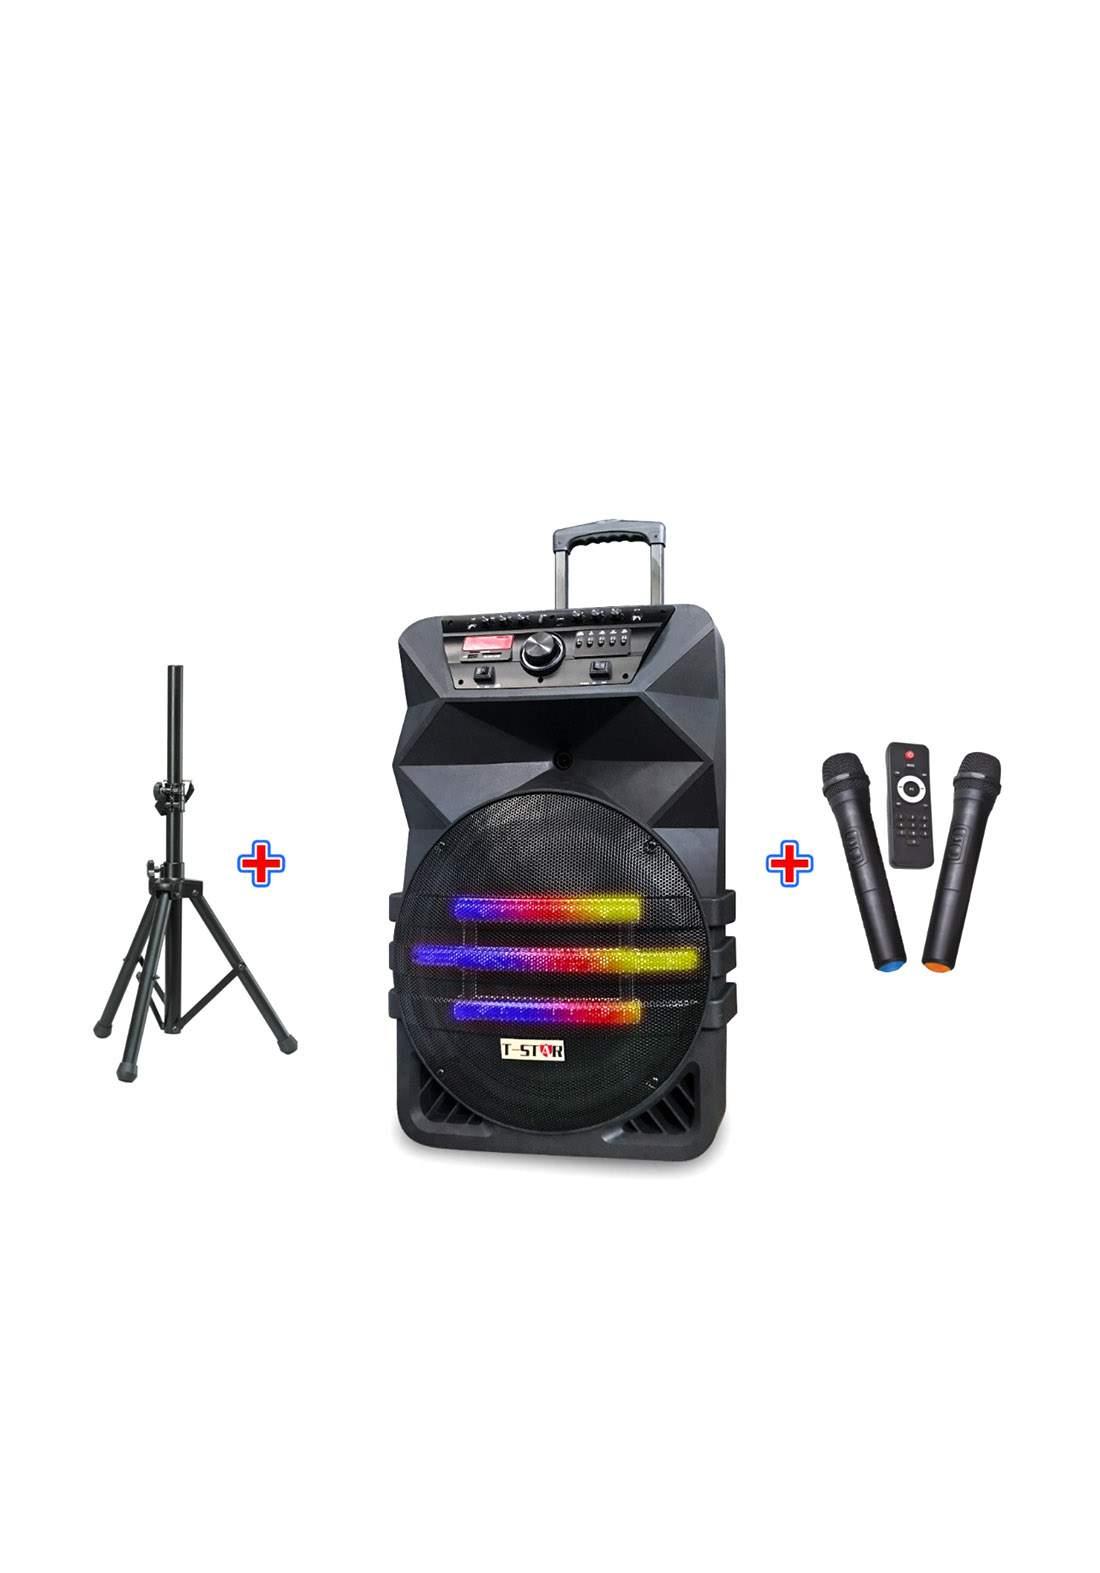 FM USB BT Wireless Speaker - Black (T-107A) سبيكر